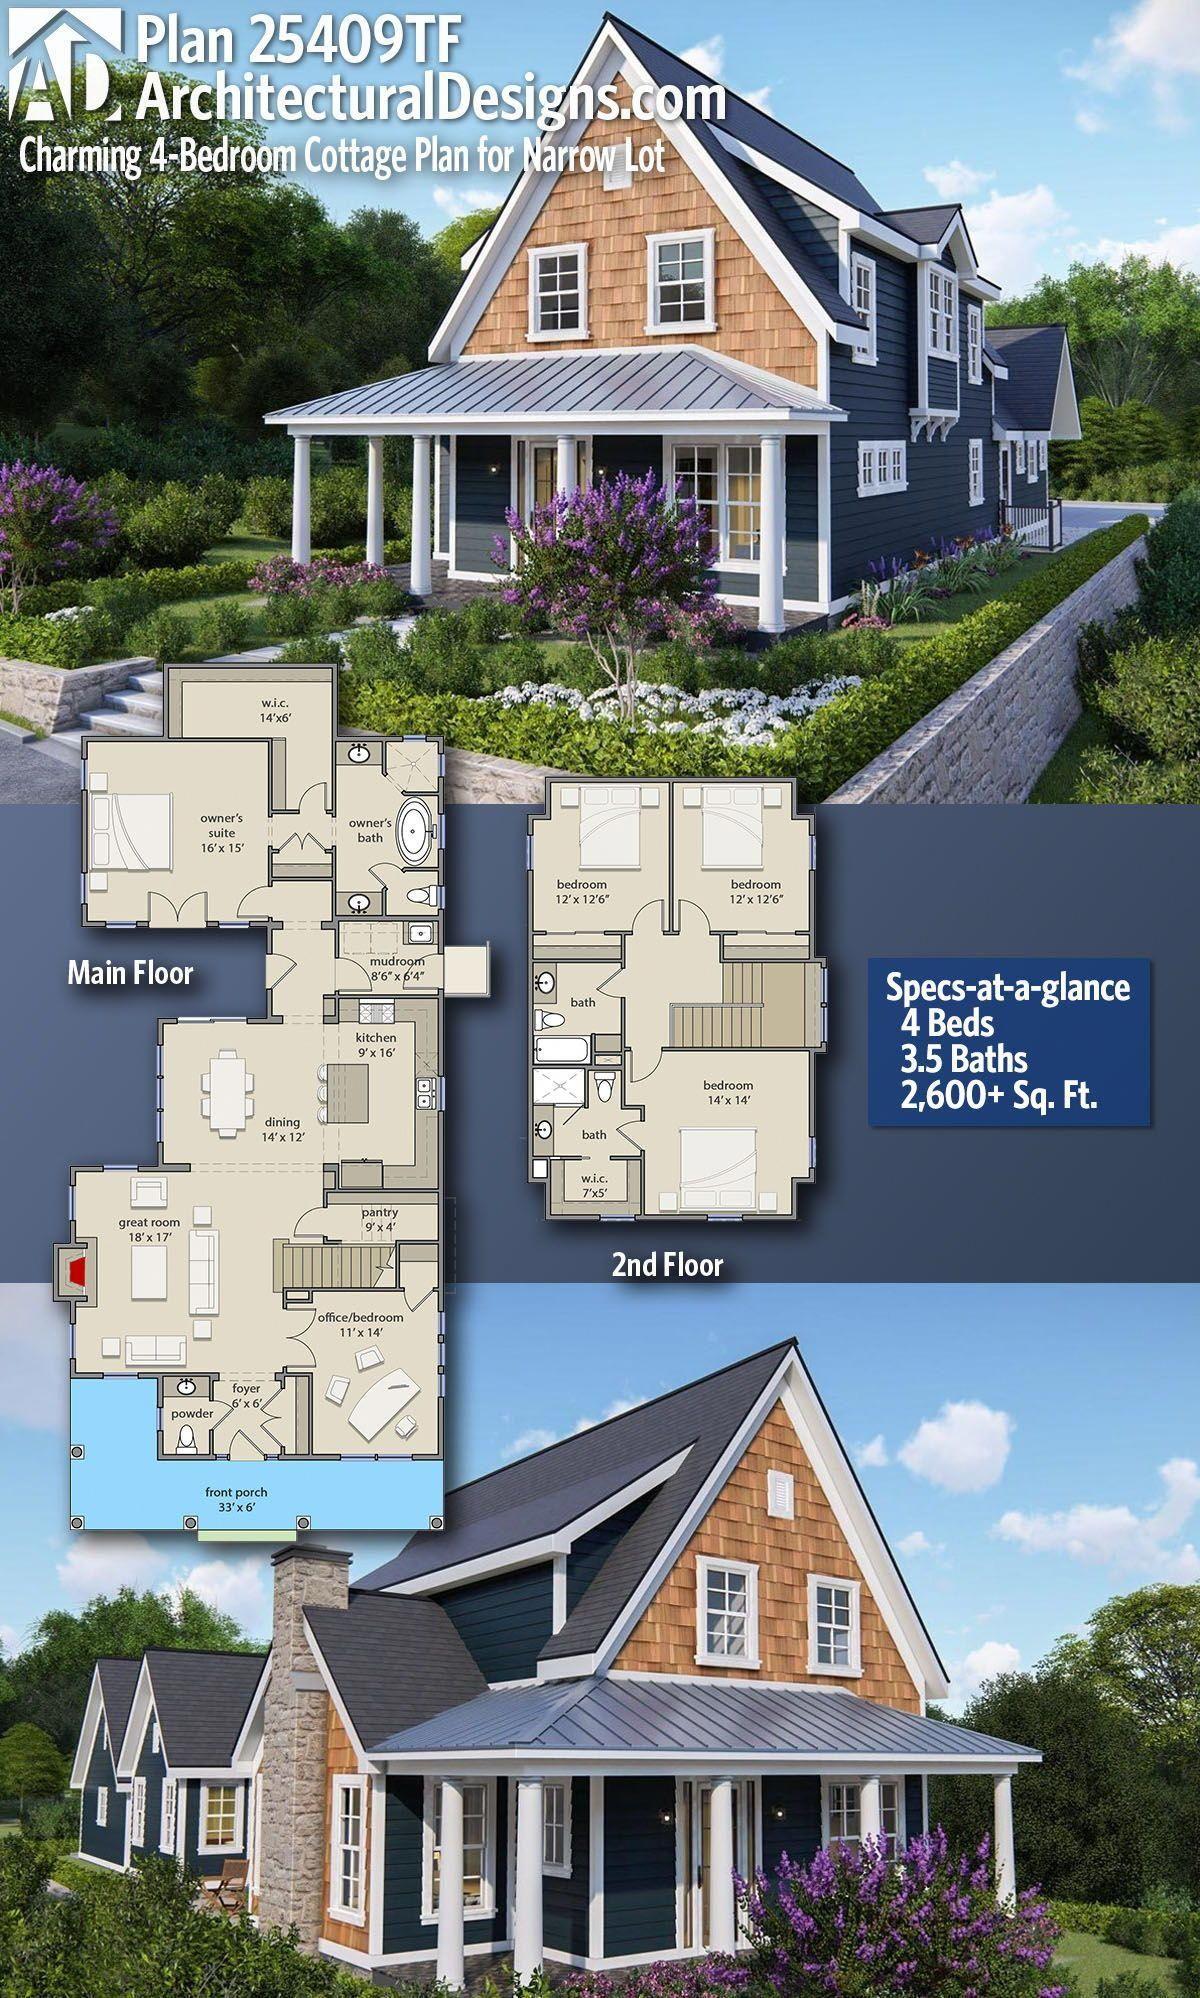 This Excellent Photo Is Certainly An Inspiring And Marvelous Idea Beachcottage Cottage Plan Farmhouse Cottage Plans House Floor Plans